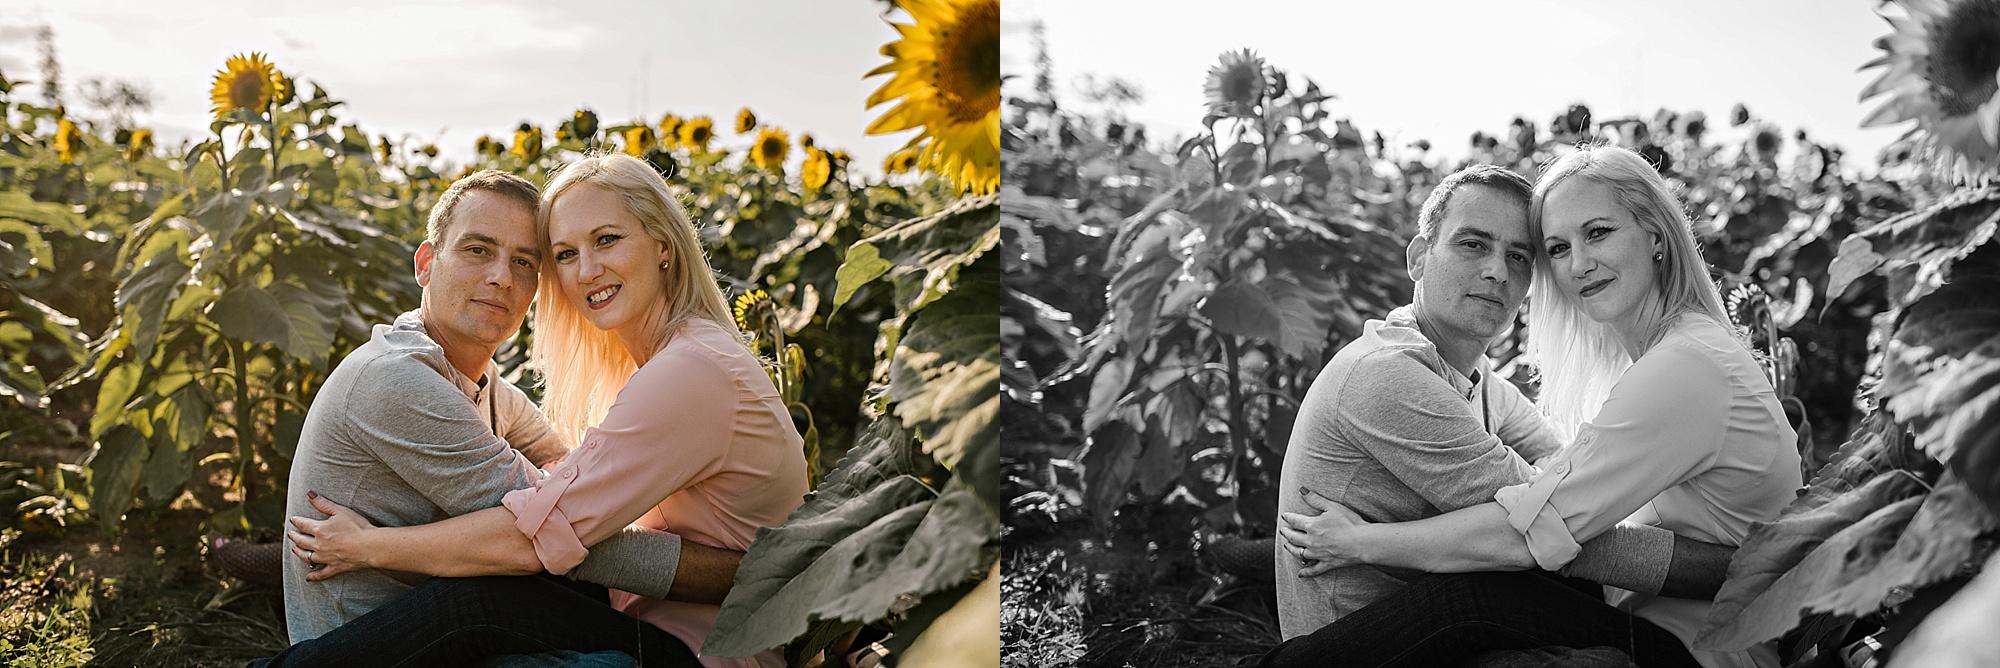 Lori-and-mike-akron-ohio-photographer-lauren-grayson-sunflower-field-session_0014.jpg